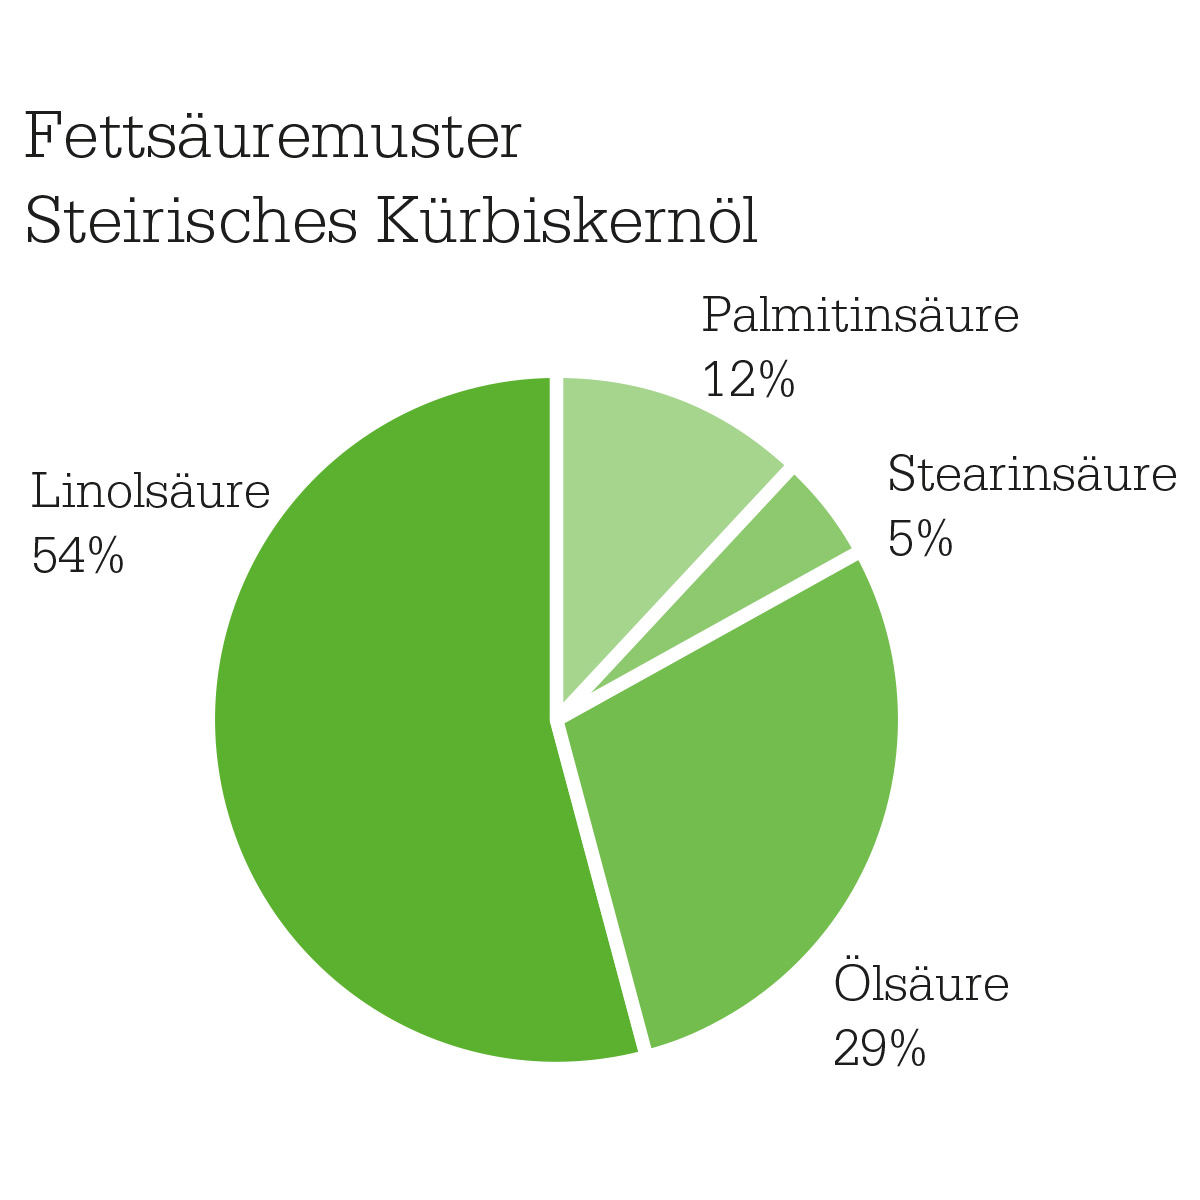 Fettsäuremuster Senger's Steirischen Kürbiskernöls g.g.A.